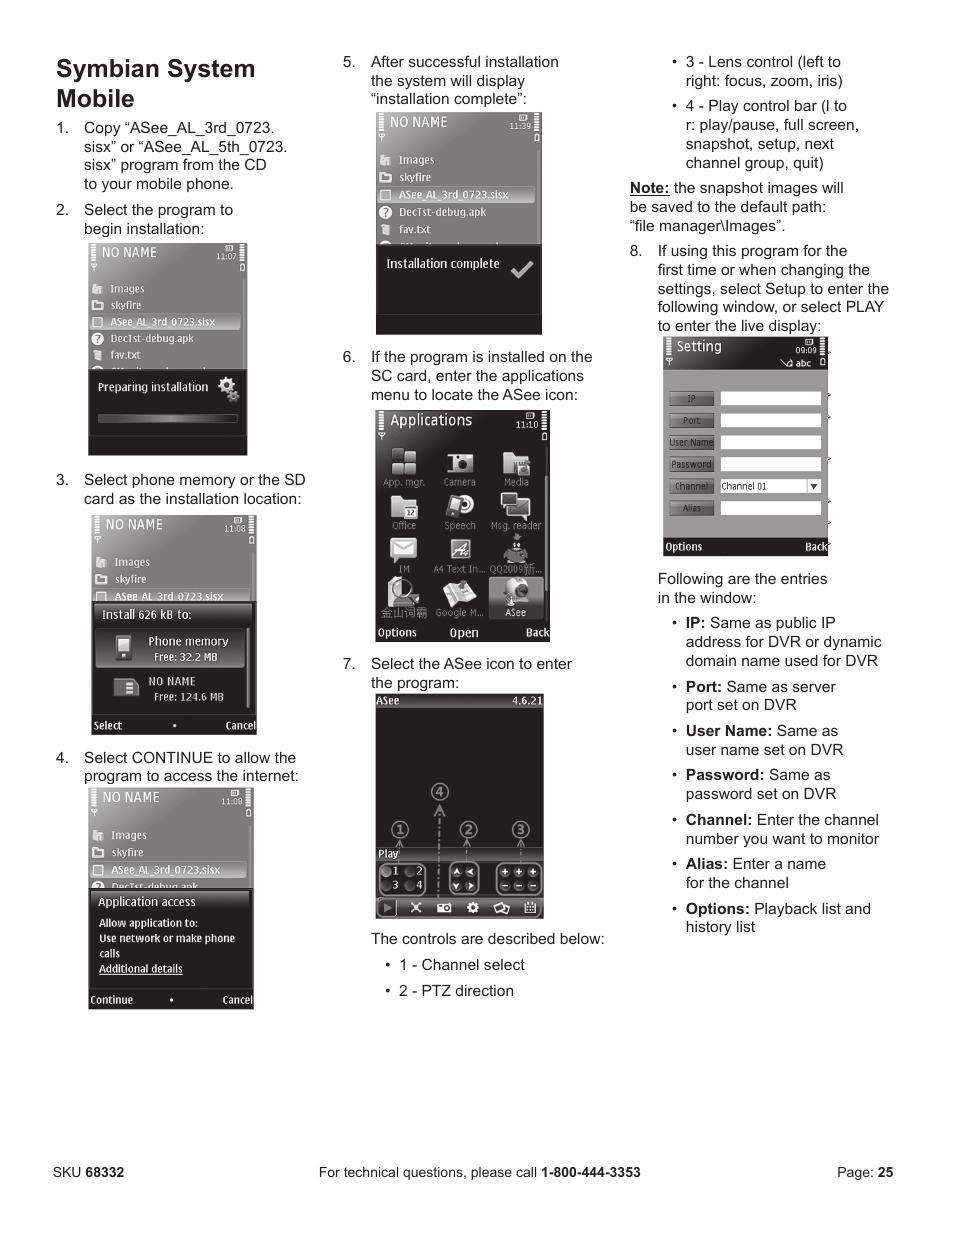 Bunker Hill Security Mobile Setup : bunker, security, mobile, setup, Symbian, System, Mobile, Harbor, Freight, Tools, BUNKER, SECURITY, 68332, Manual